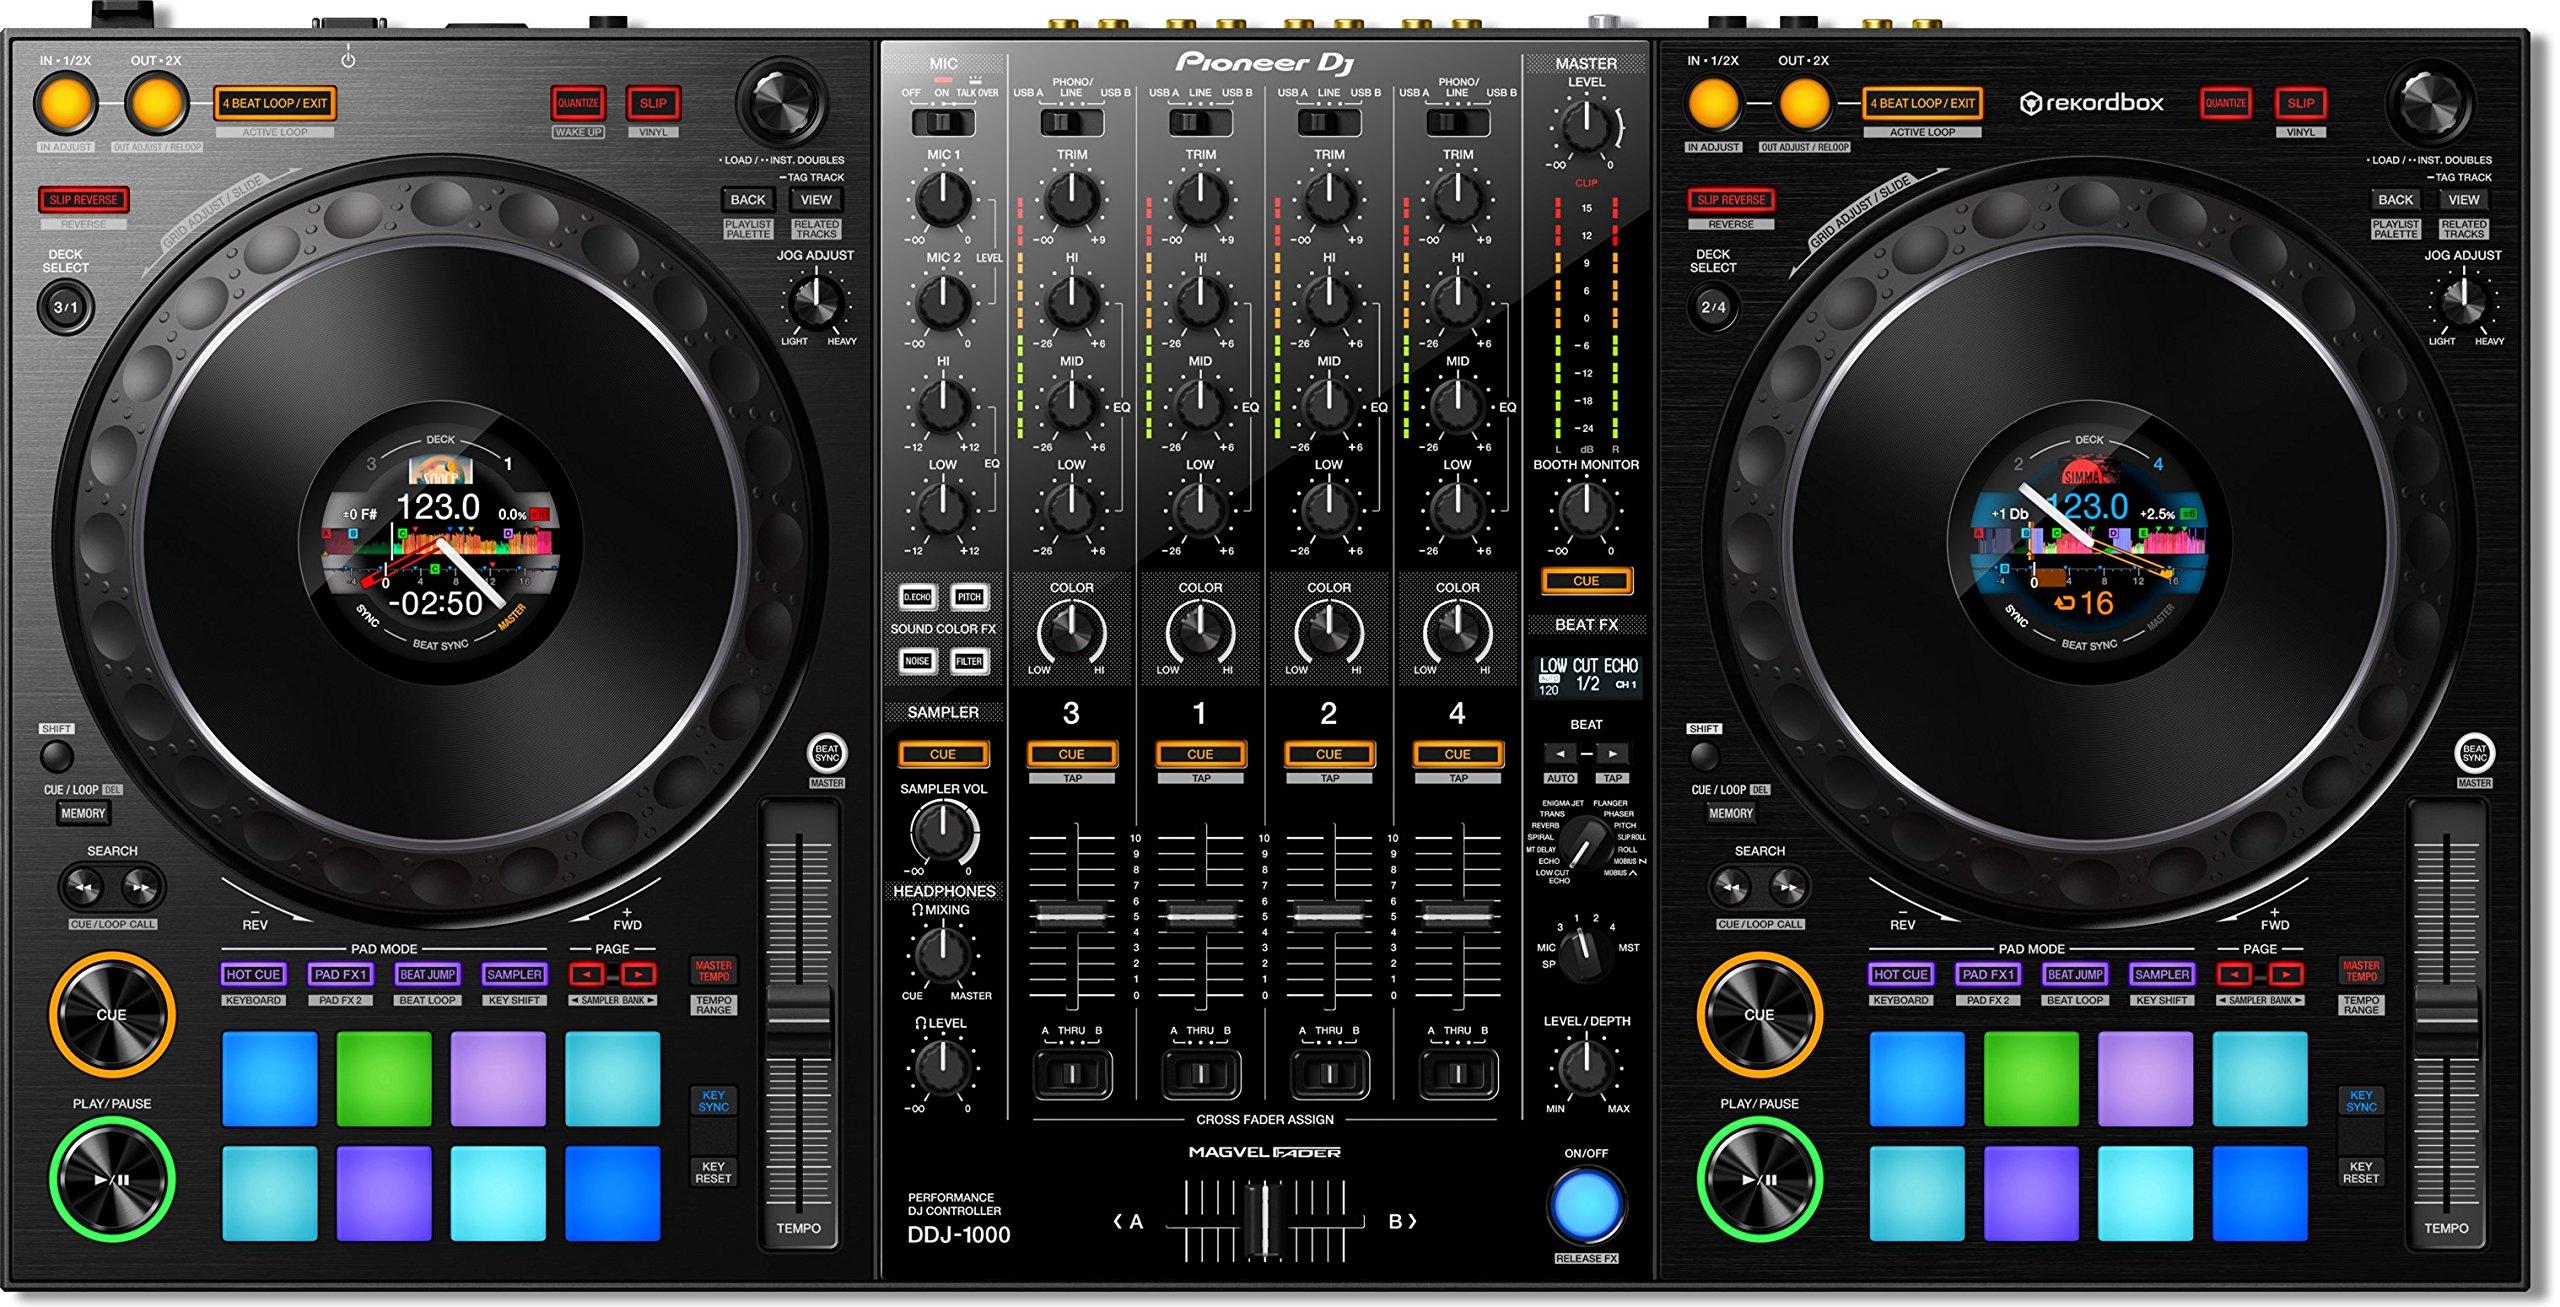 Pioneer DJ DDJ-1000 Professional DJ 4 channel controller - rekordbox by Pioneer (Image #1)